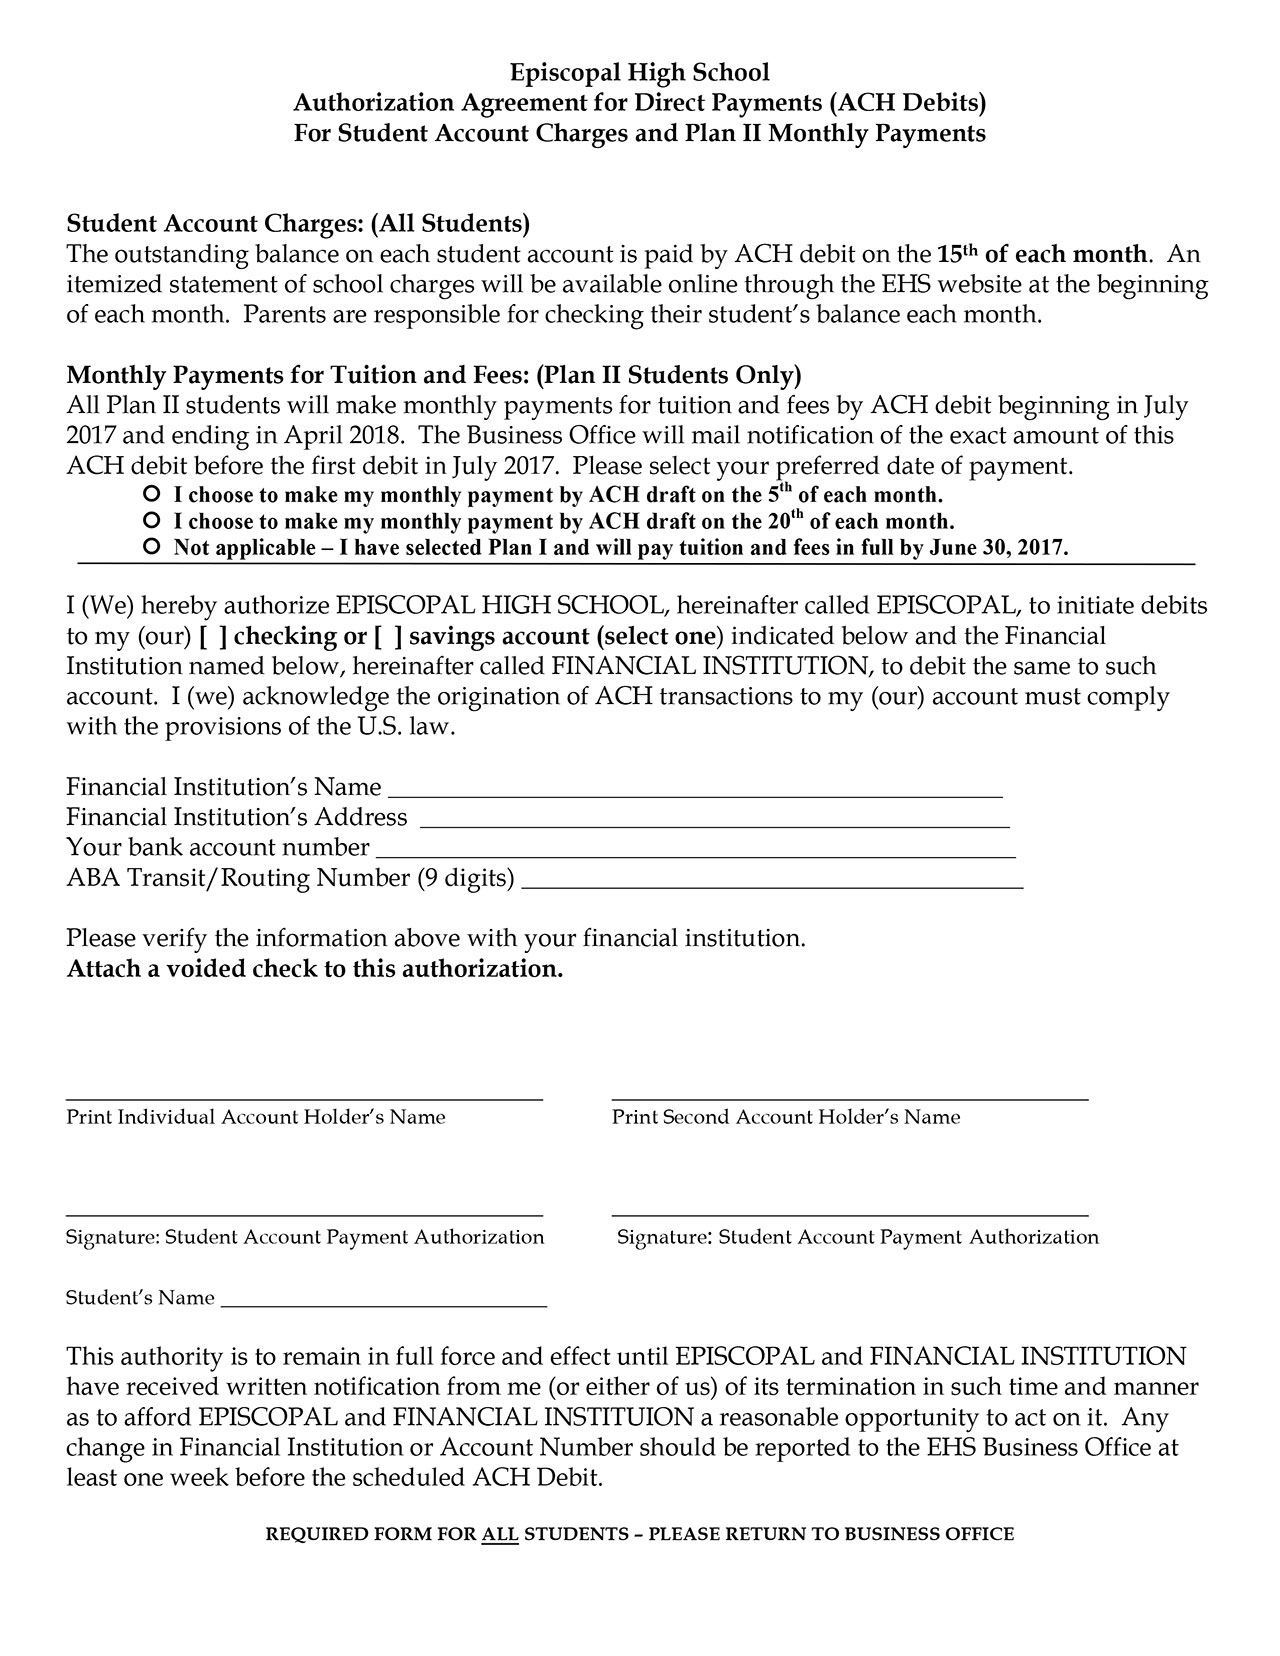 Authorization Agreement for ACH Debits - Episcopal High School ...